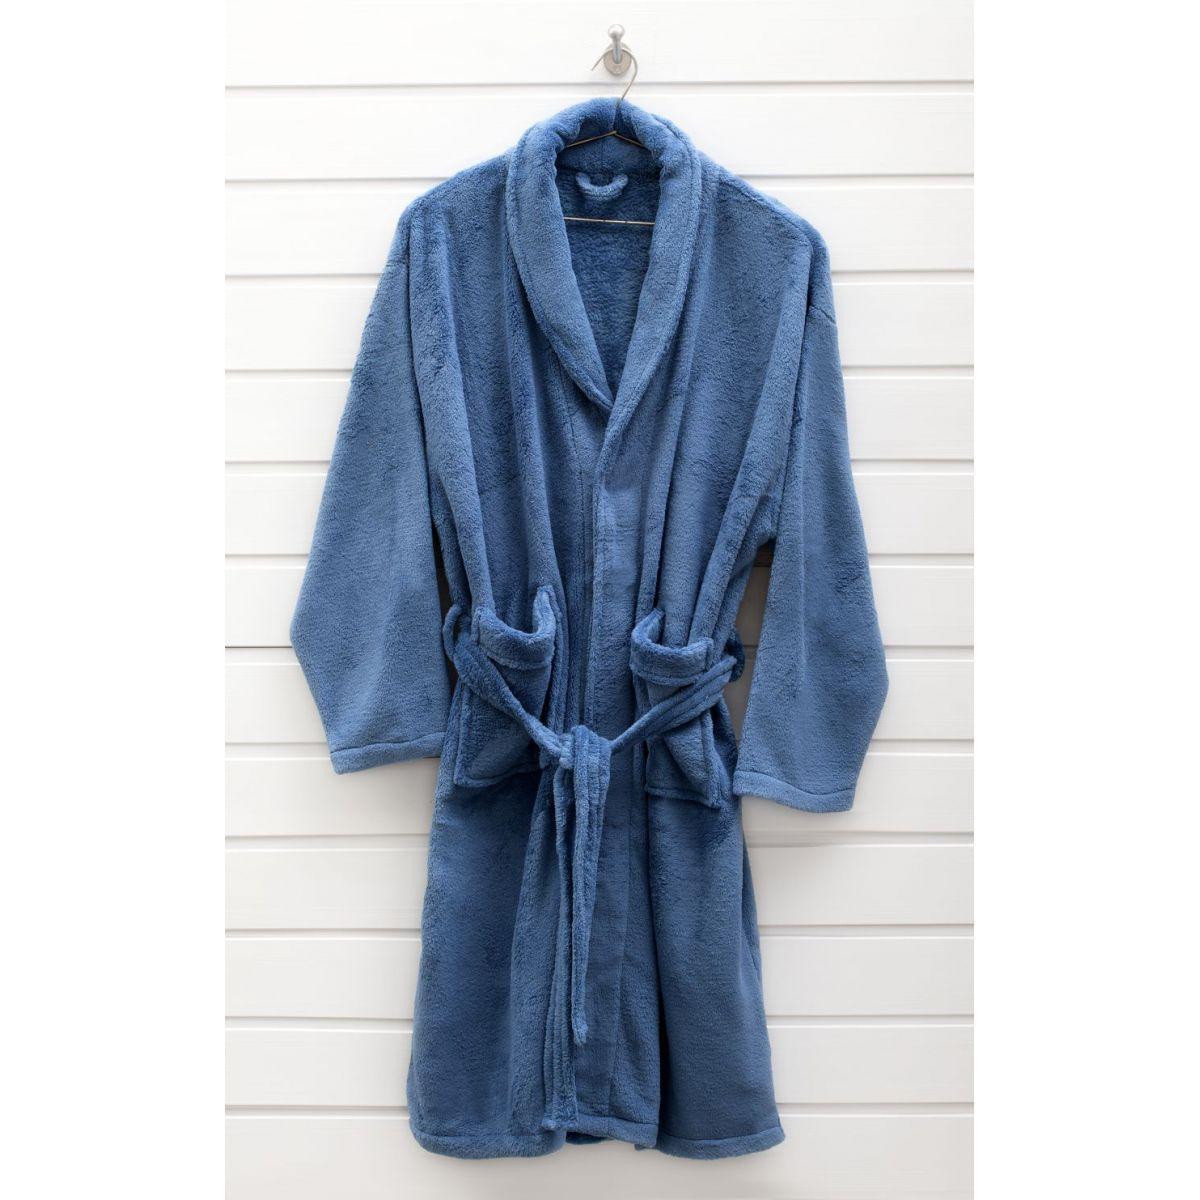 5b70098adf9923 Roupão Microfibra Adulto Home Design Azul Indigo M 62x102cm Corttex